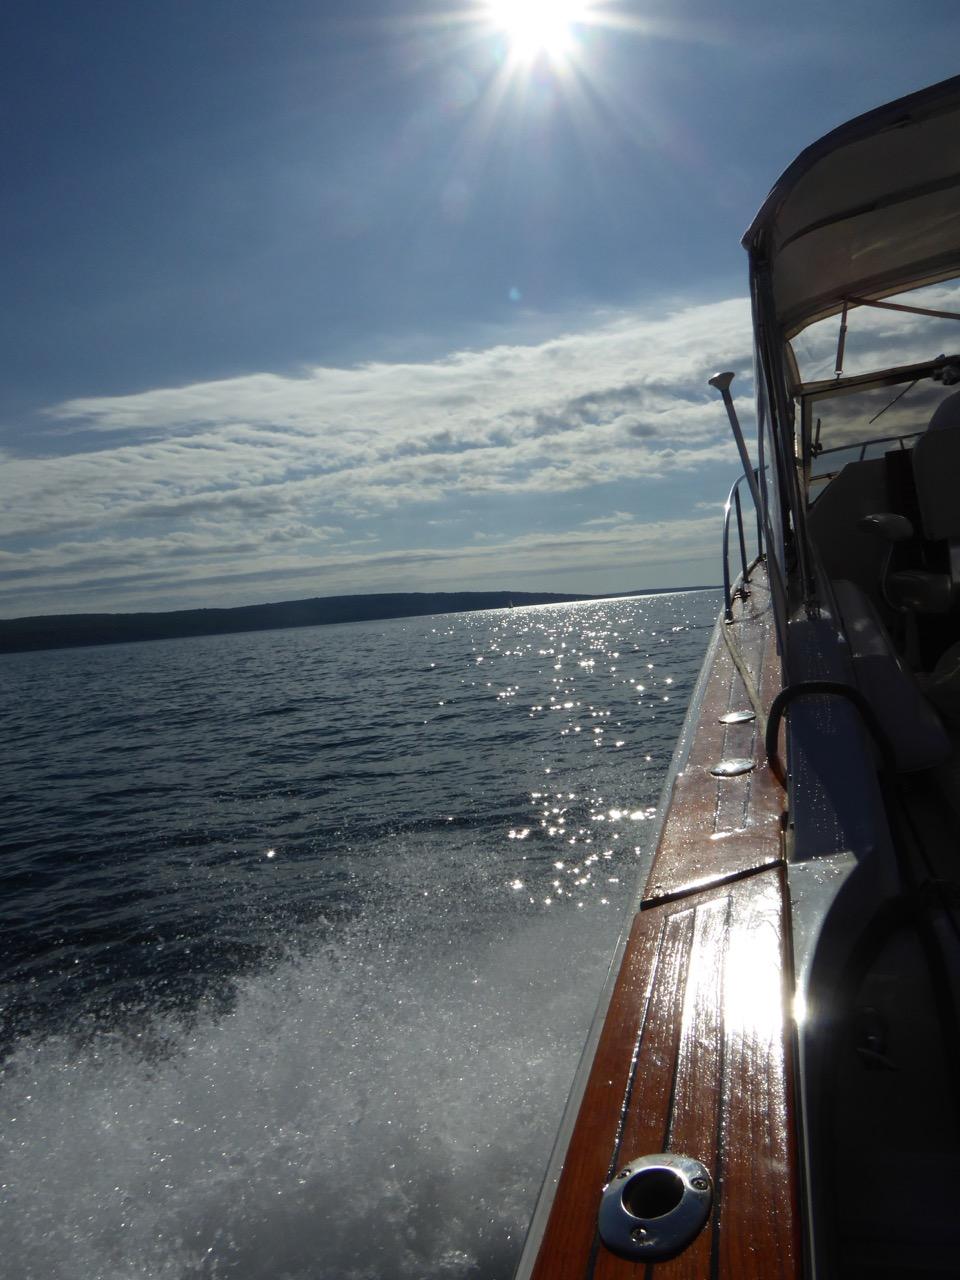 cindi_ferry_boats_rocks_spiritedtable_photo07.jpg